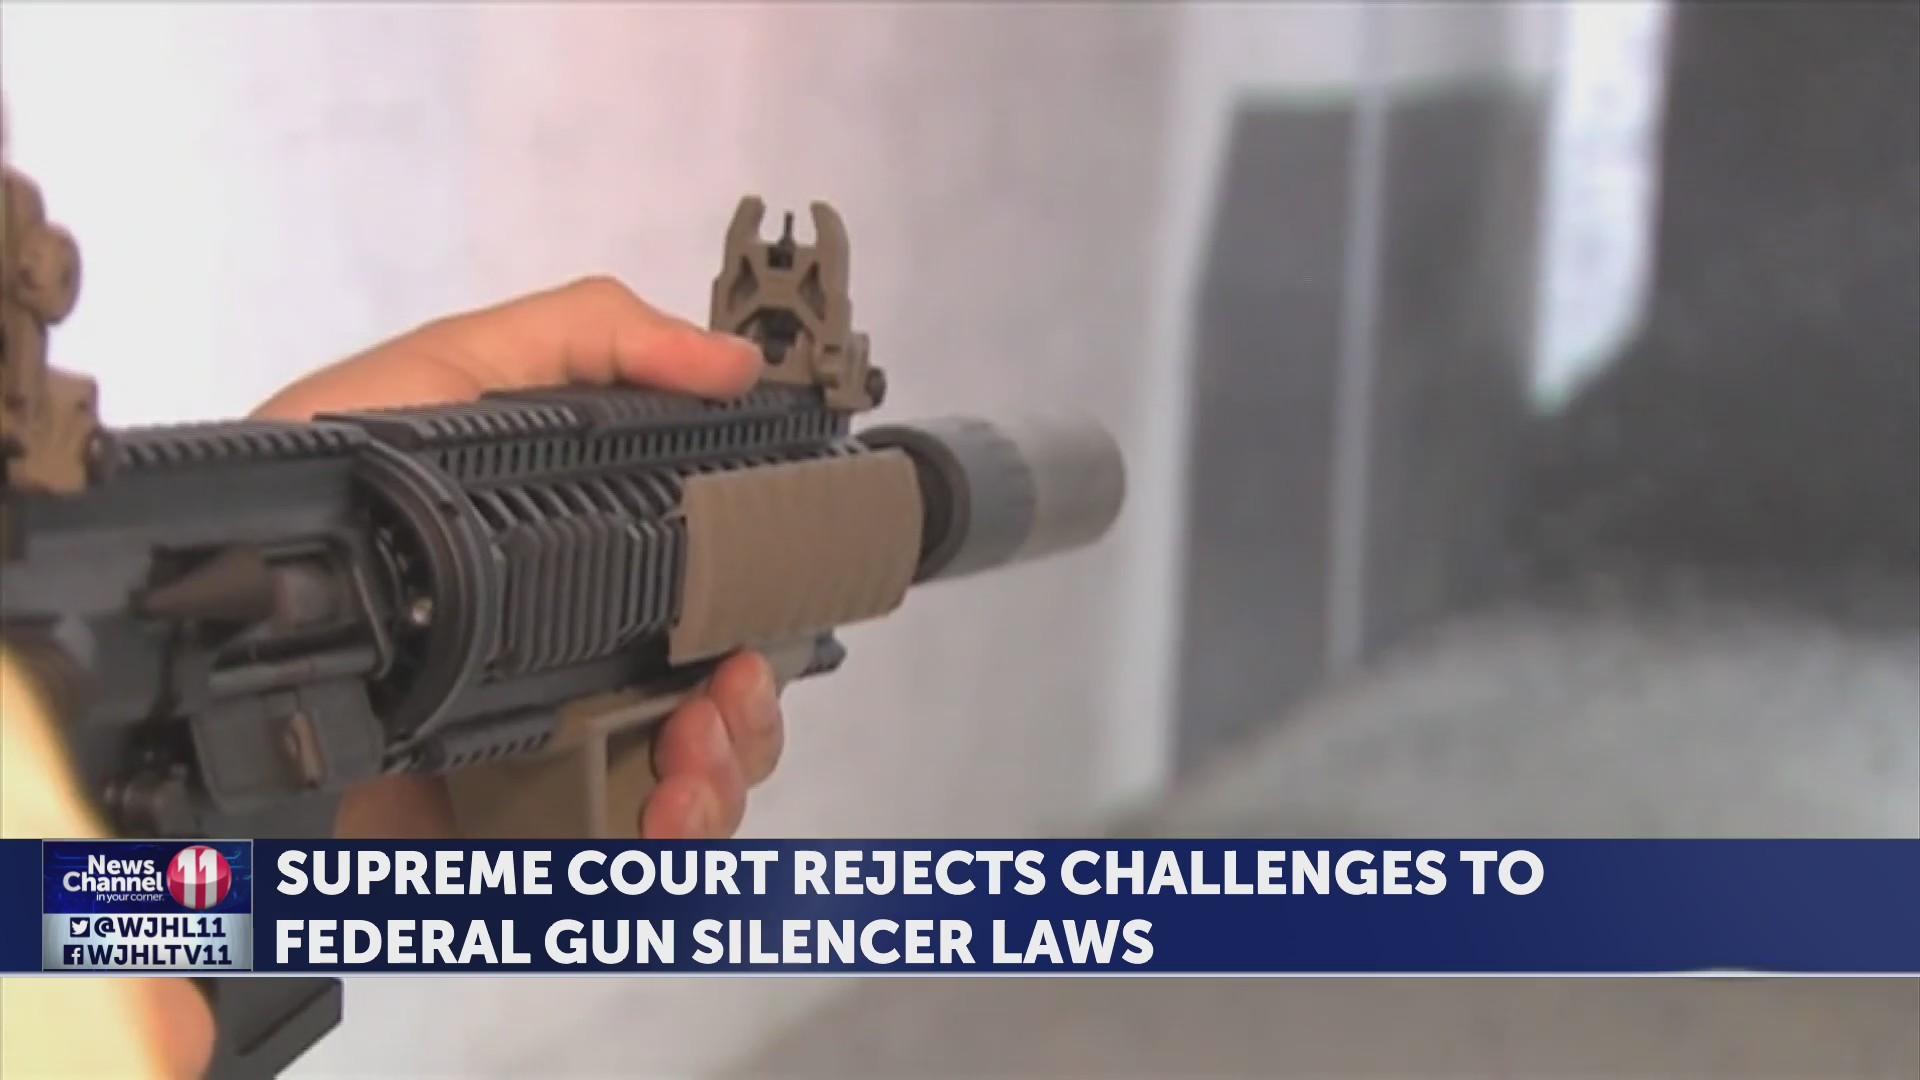 Supreme Court refuses to change gun silencer laws